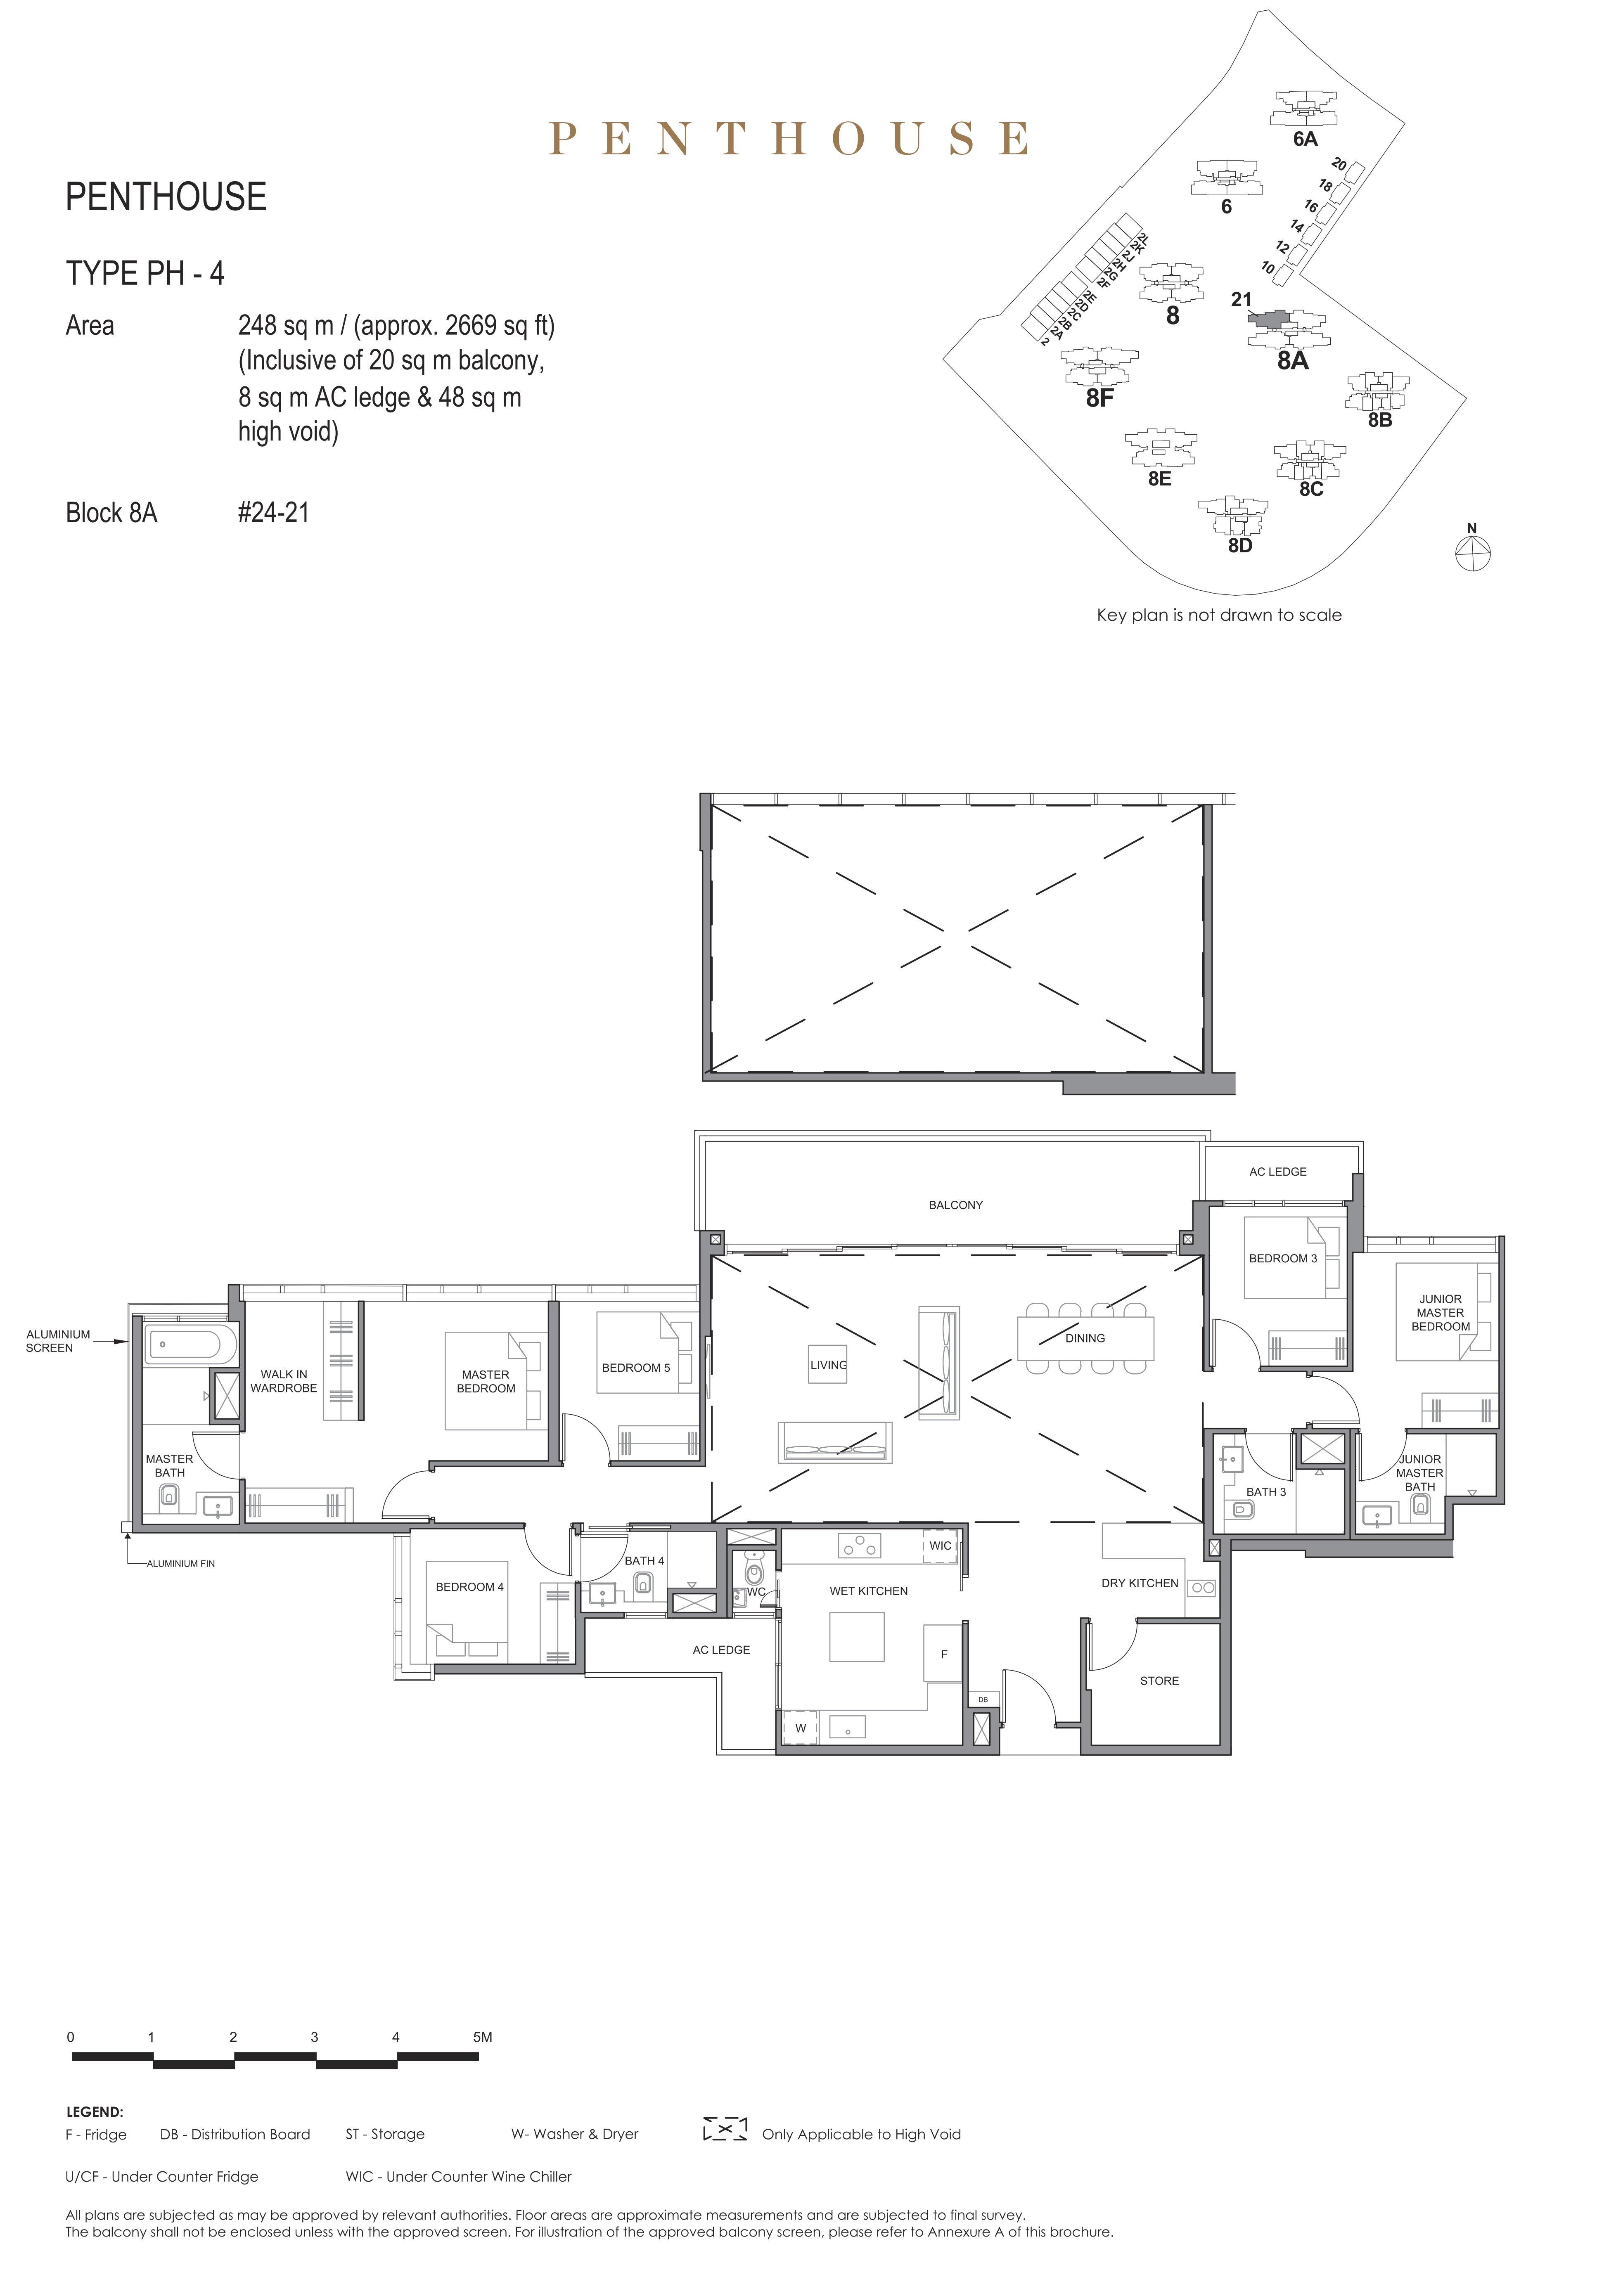 Parc Clematis 锦泰门第 elegance penthouse 5卧房 PH-4